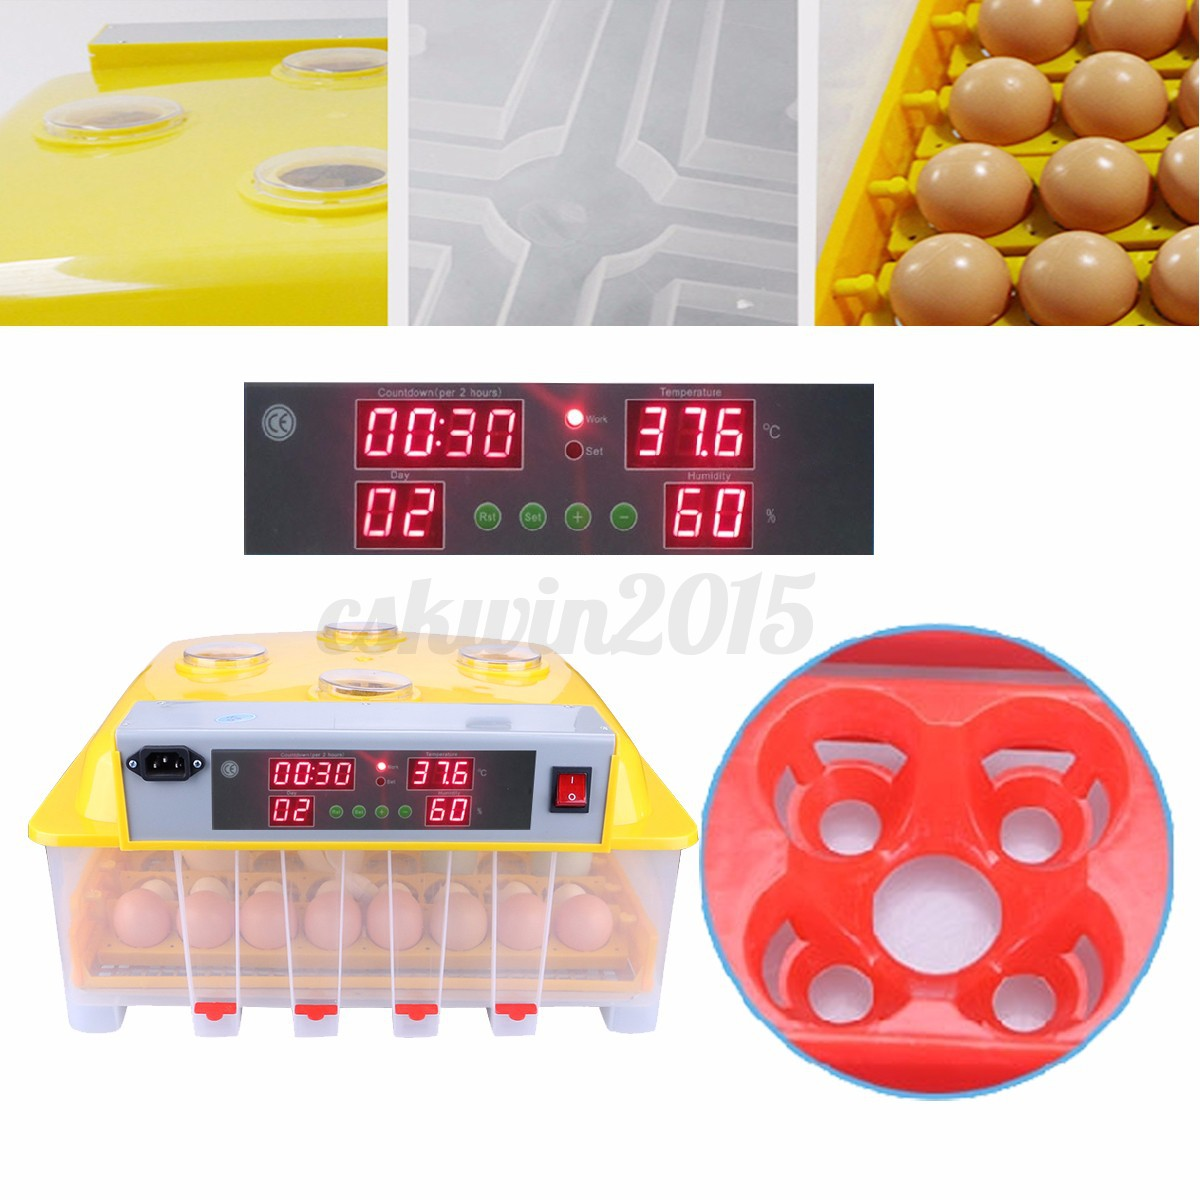 56 Digital Egg Incubator Hatcher Temperature Control Automatic Turning  #BC110F